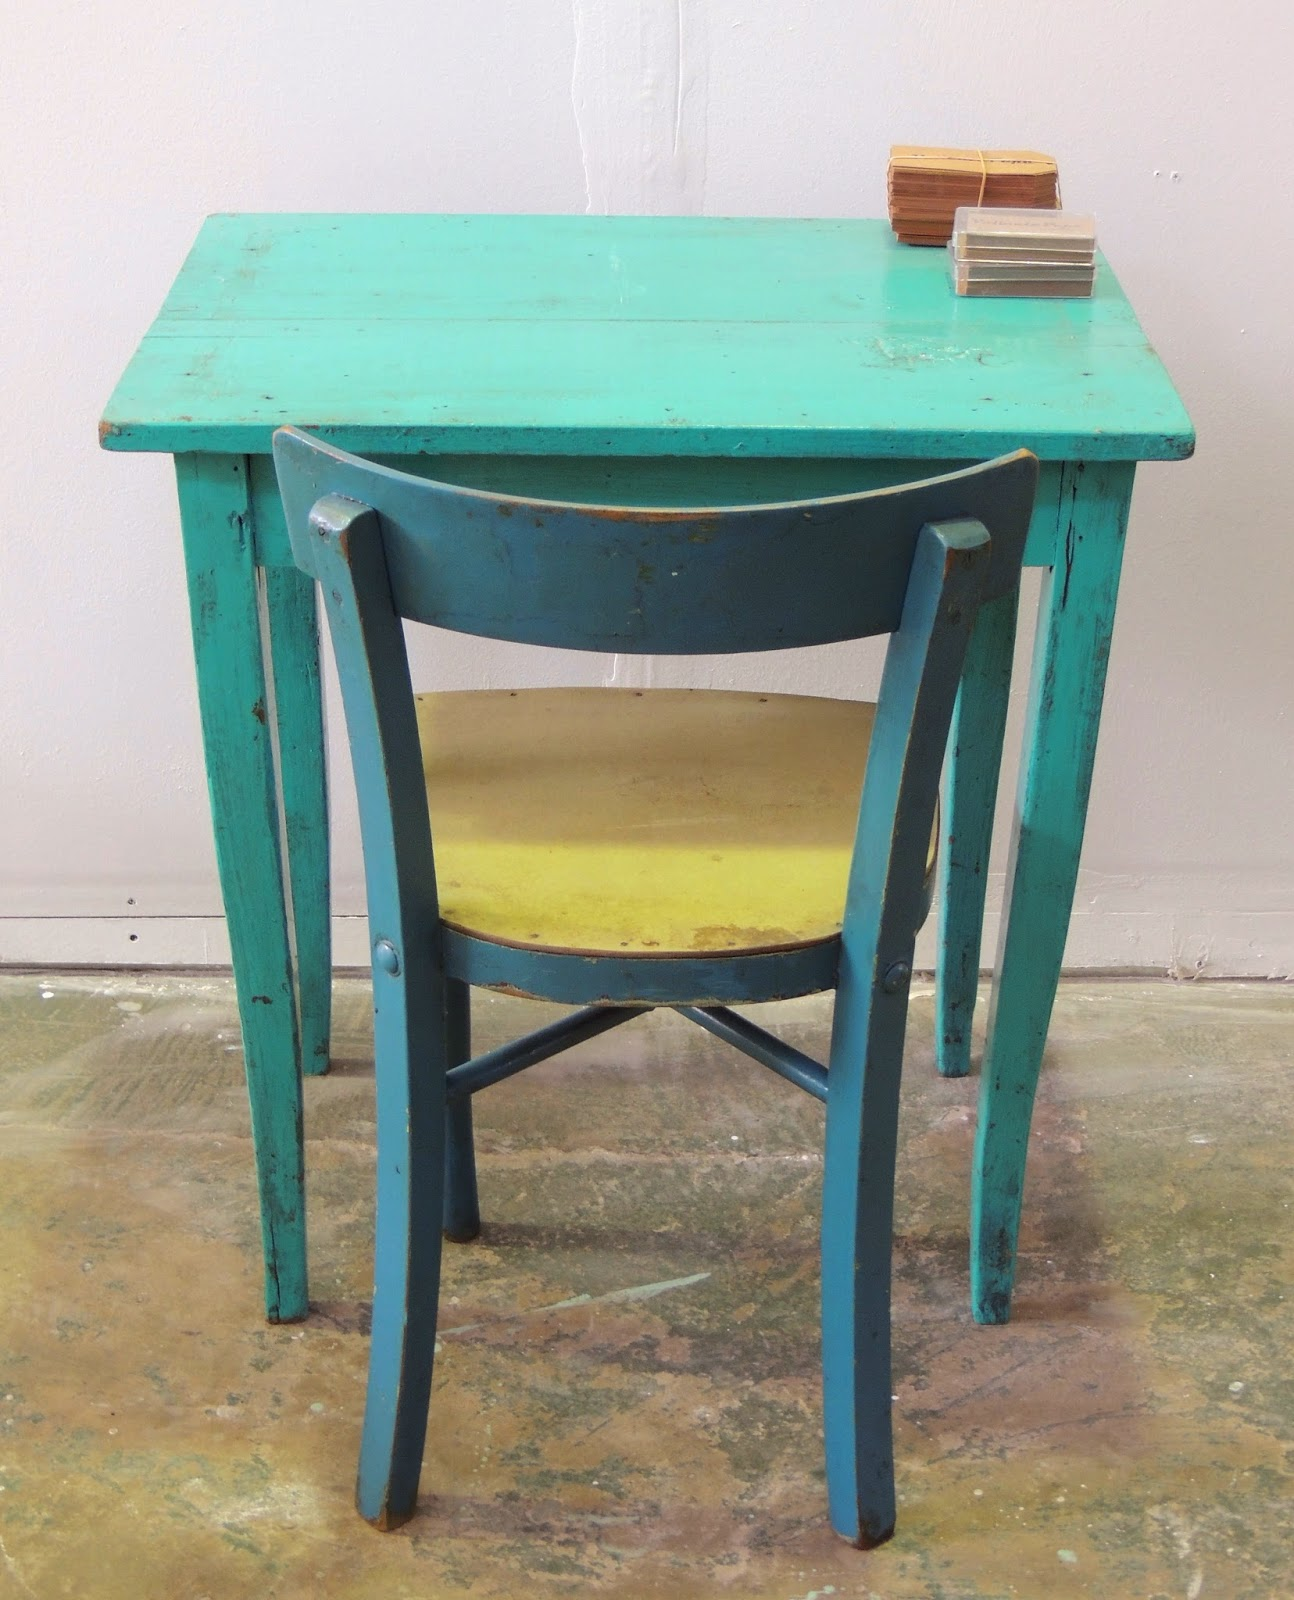 Peque a mesa de campo en turquesa con desgastes valiente - Mesa de campo ...